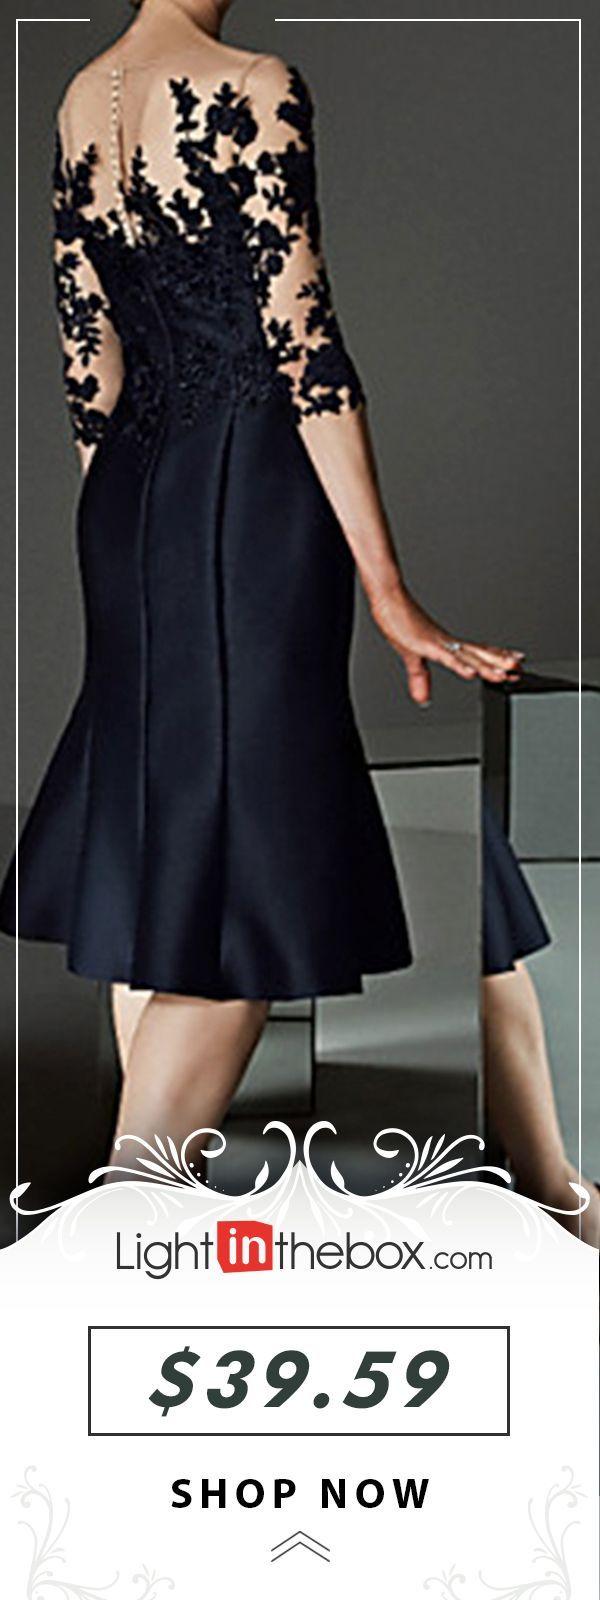 Womens Daily Elegant Sheath Dress Floral Lace Black M L Xl Xxl 2019 Women S Daily Elegant Sheat Lace Dress Outfit Black Lace Dress Outfit Black Sheath Dress [ 1600 x 600 Pixel ]